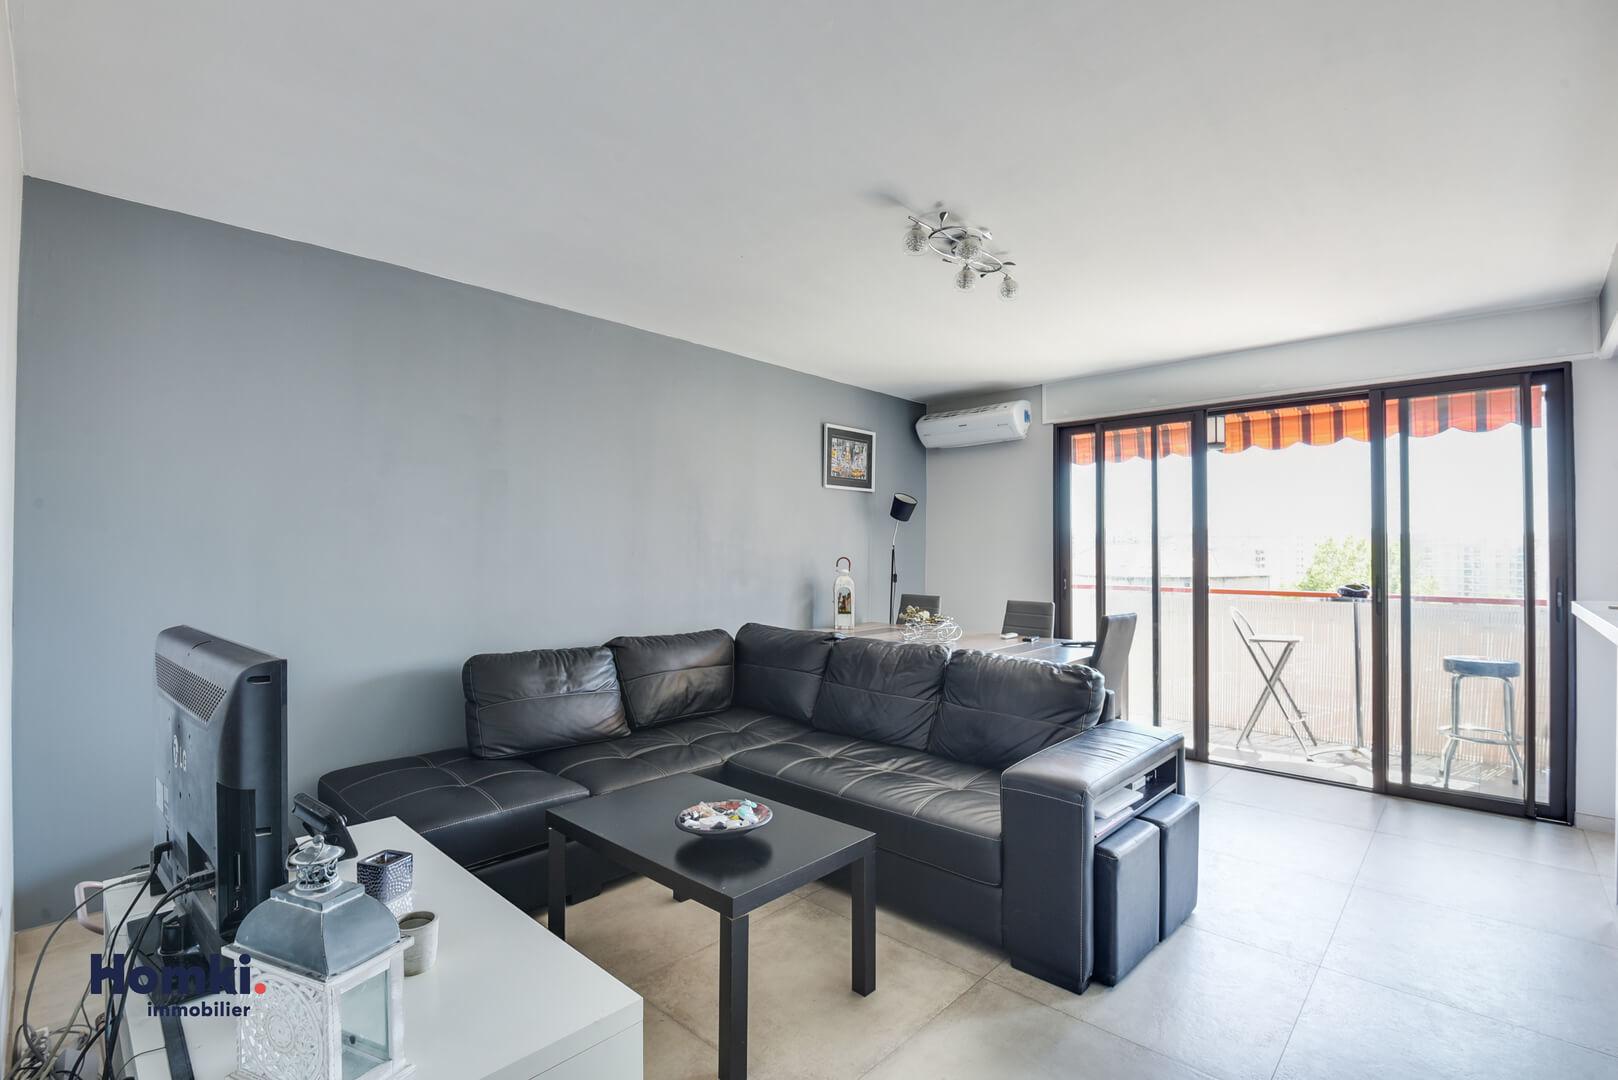 Vente Appartement 72 m² T3 13014 Marseille_2